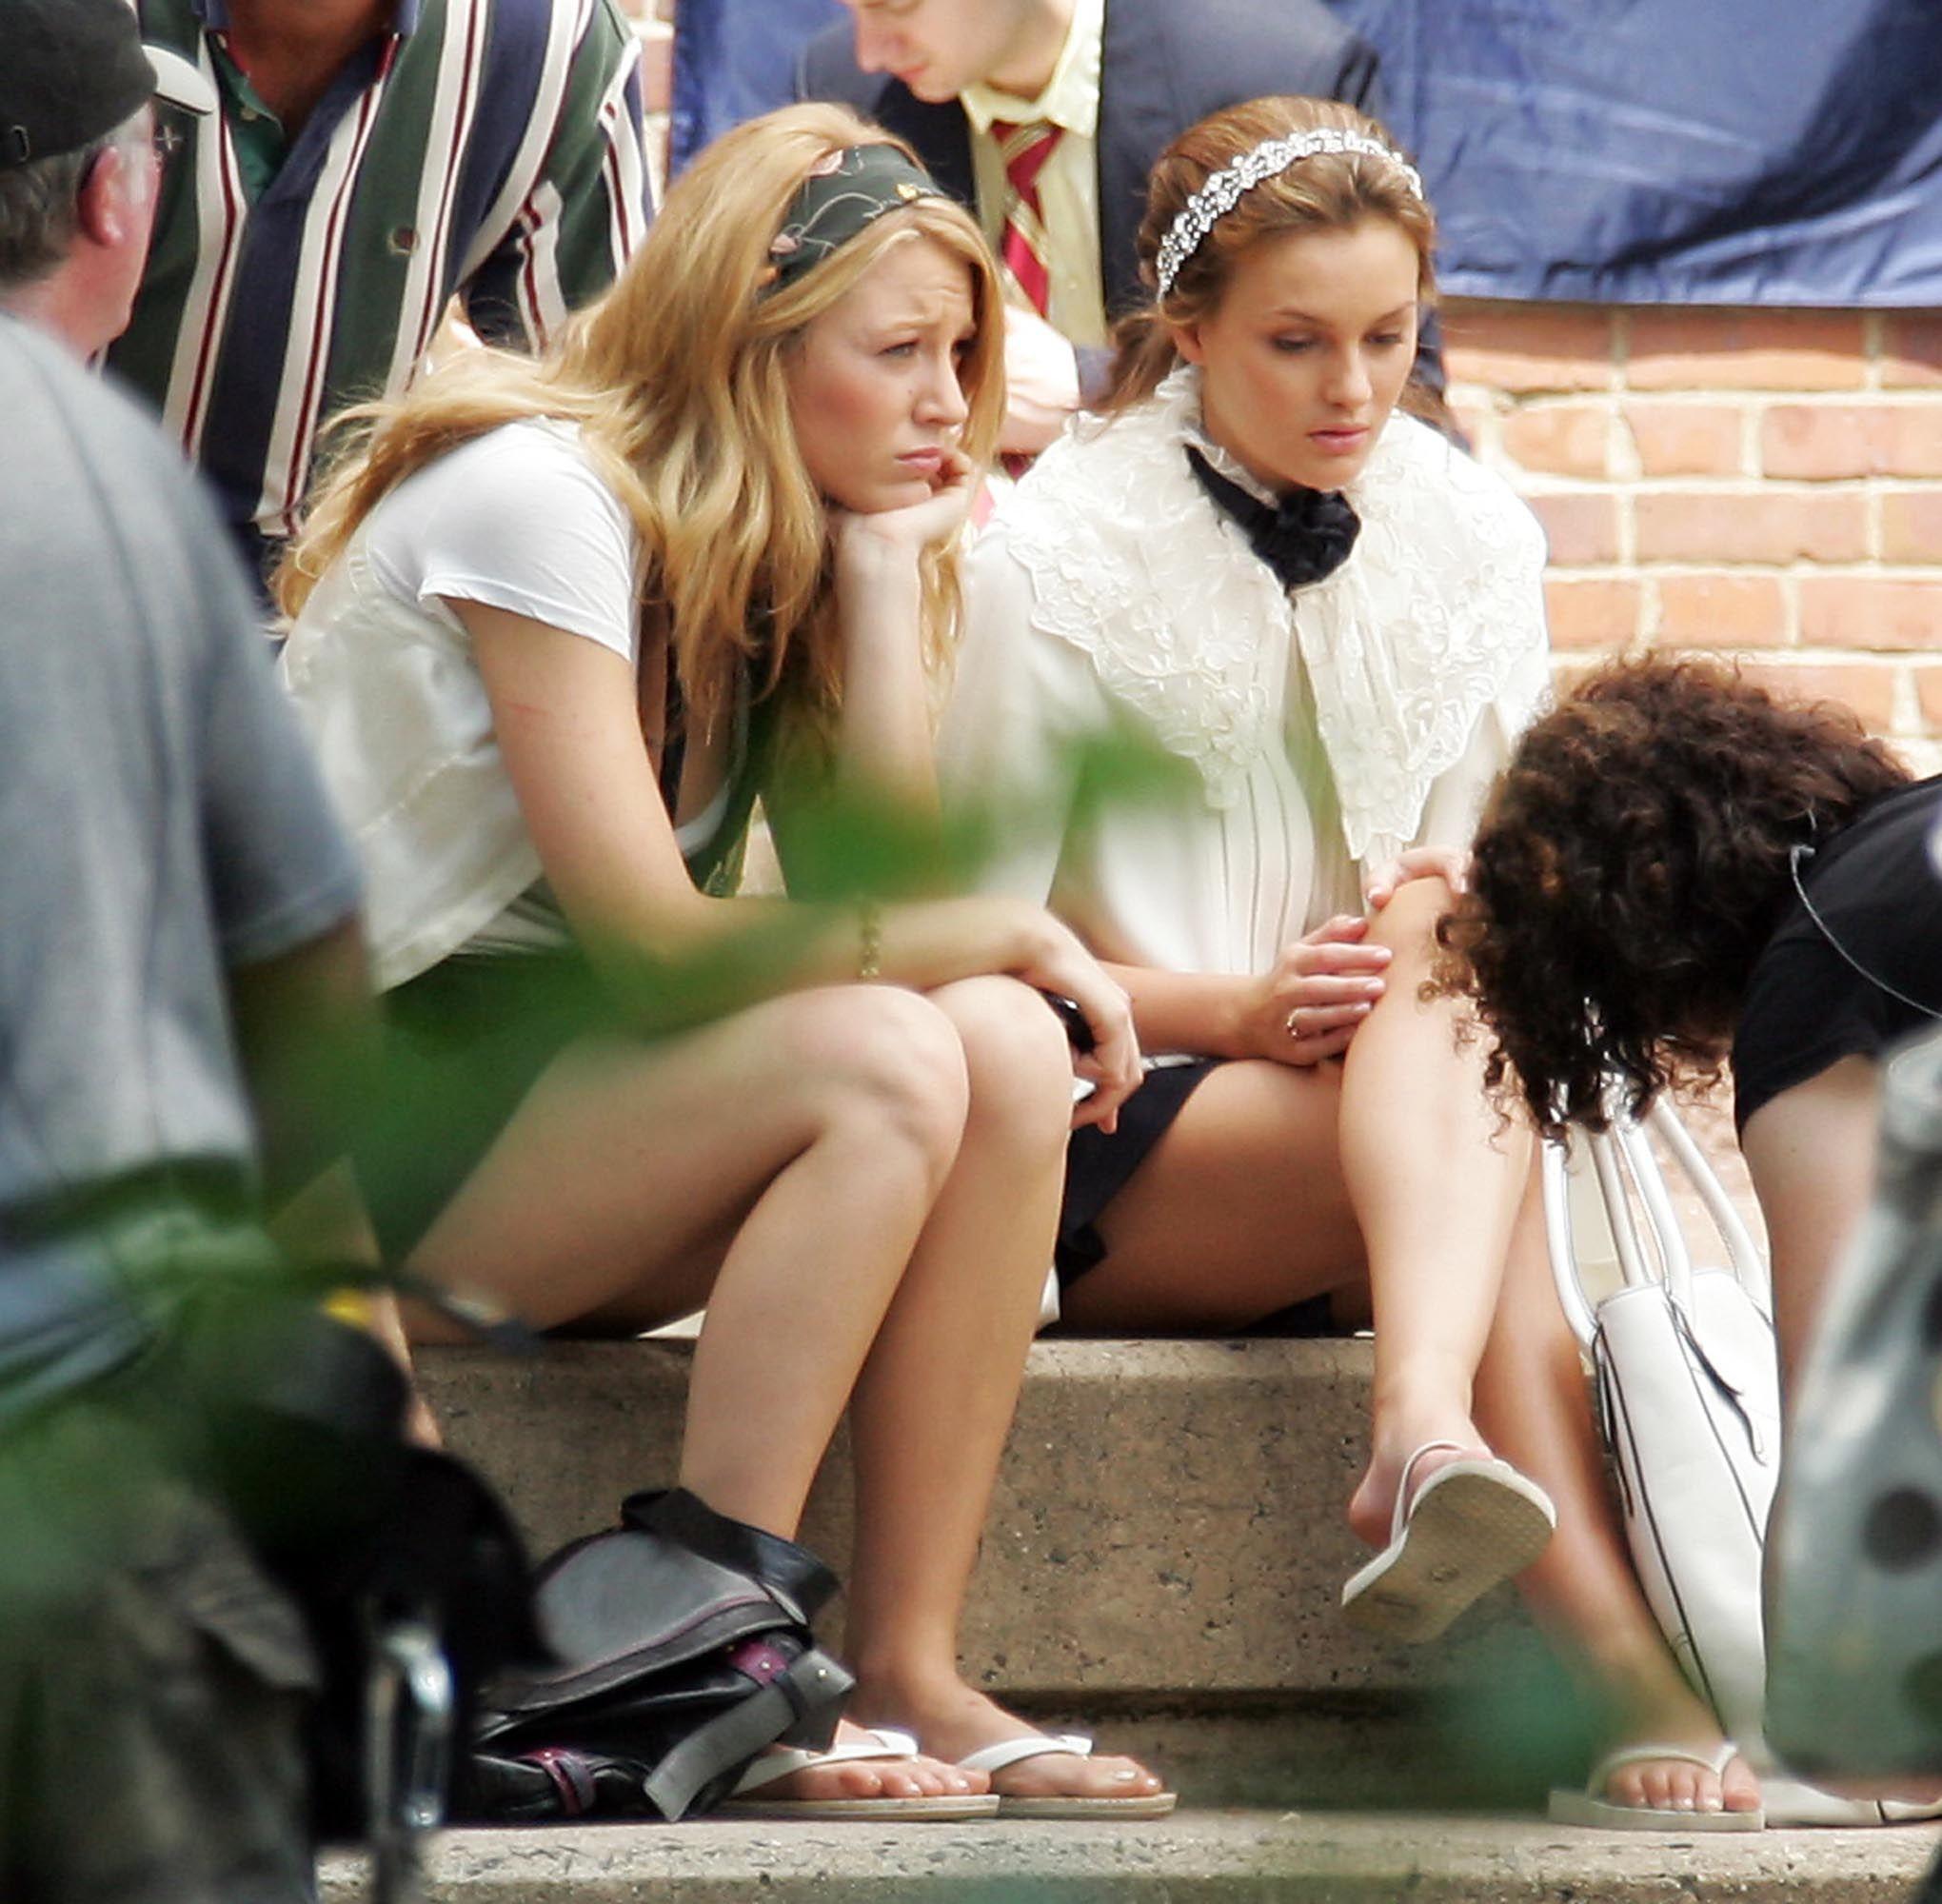 Gossip girl cast hookup each other